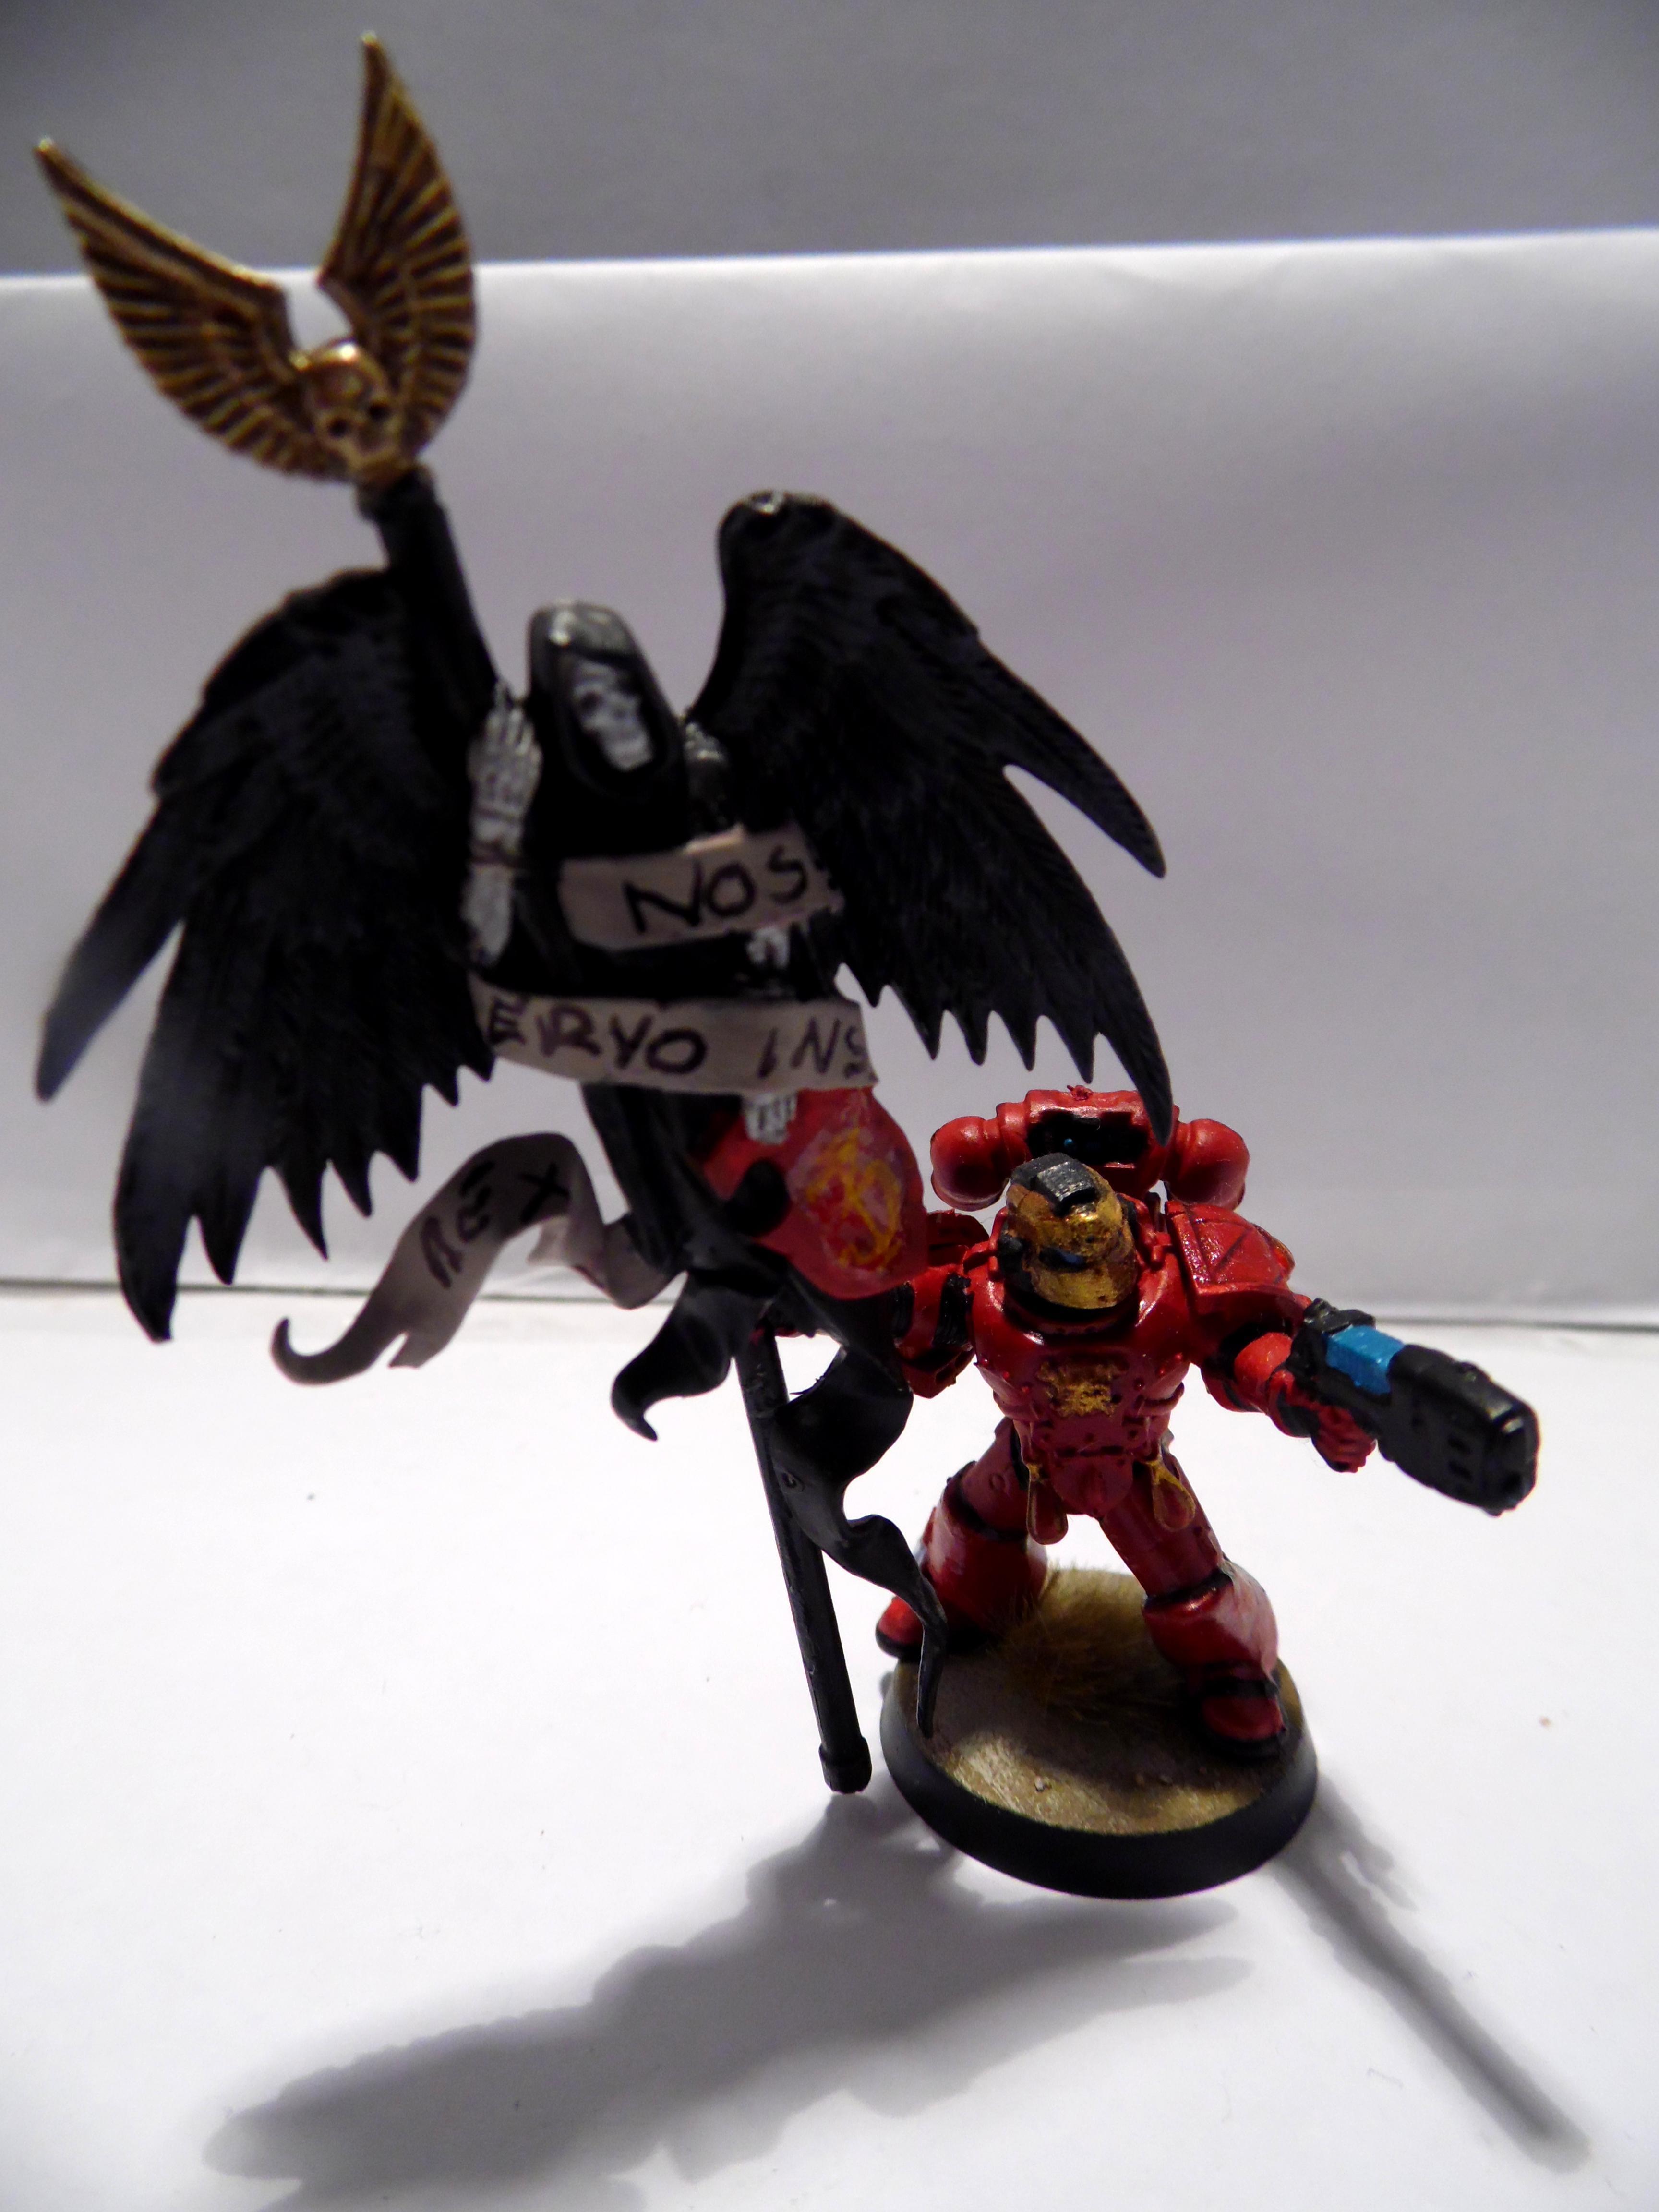 In Death We Serve, Blood angel standard